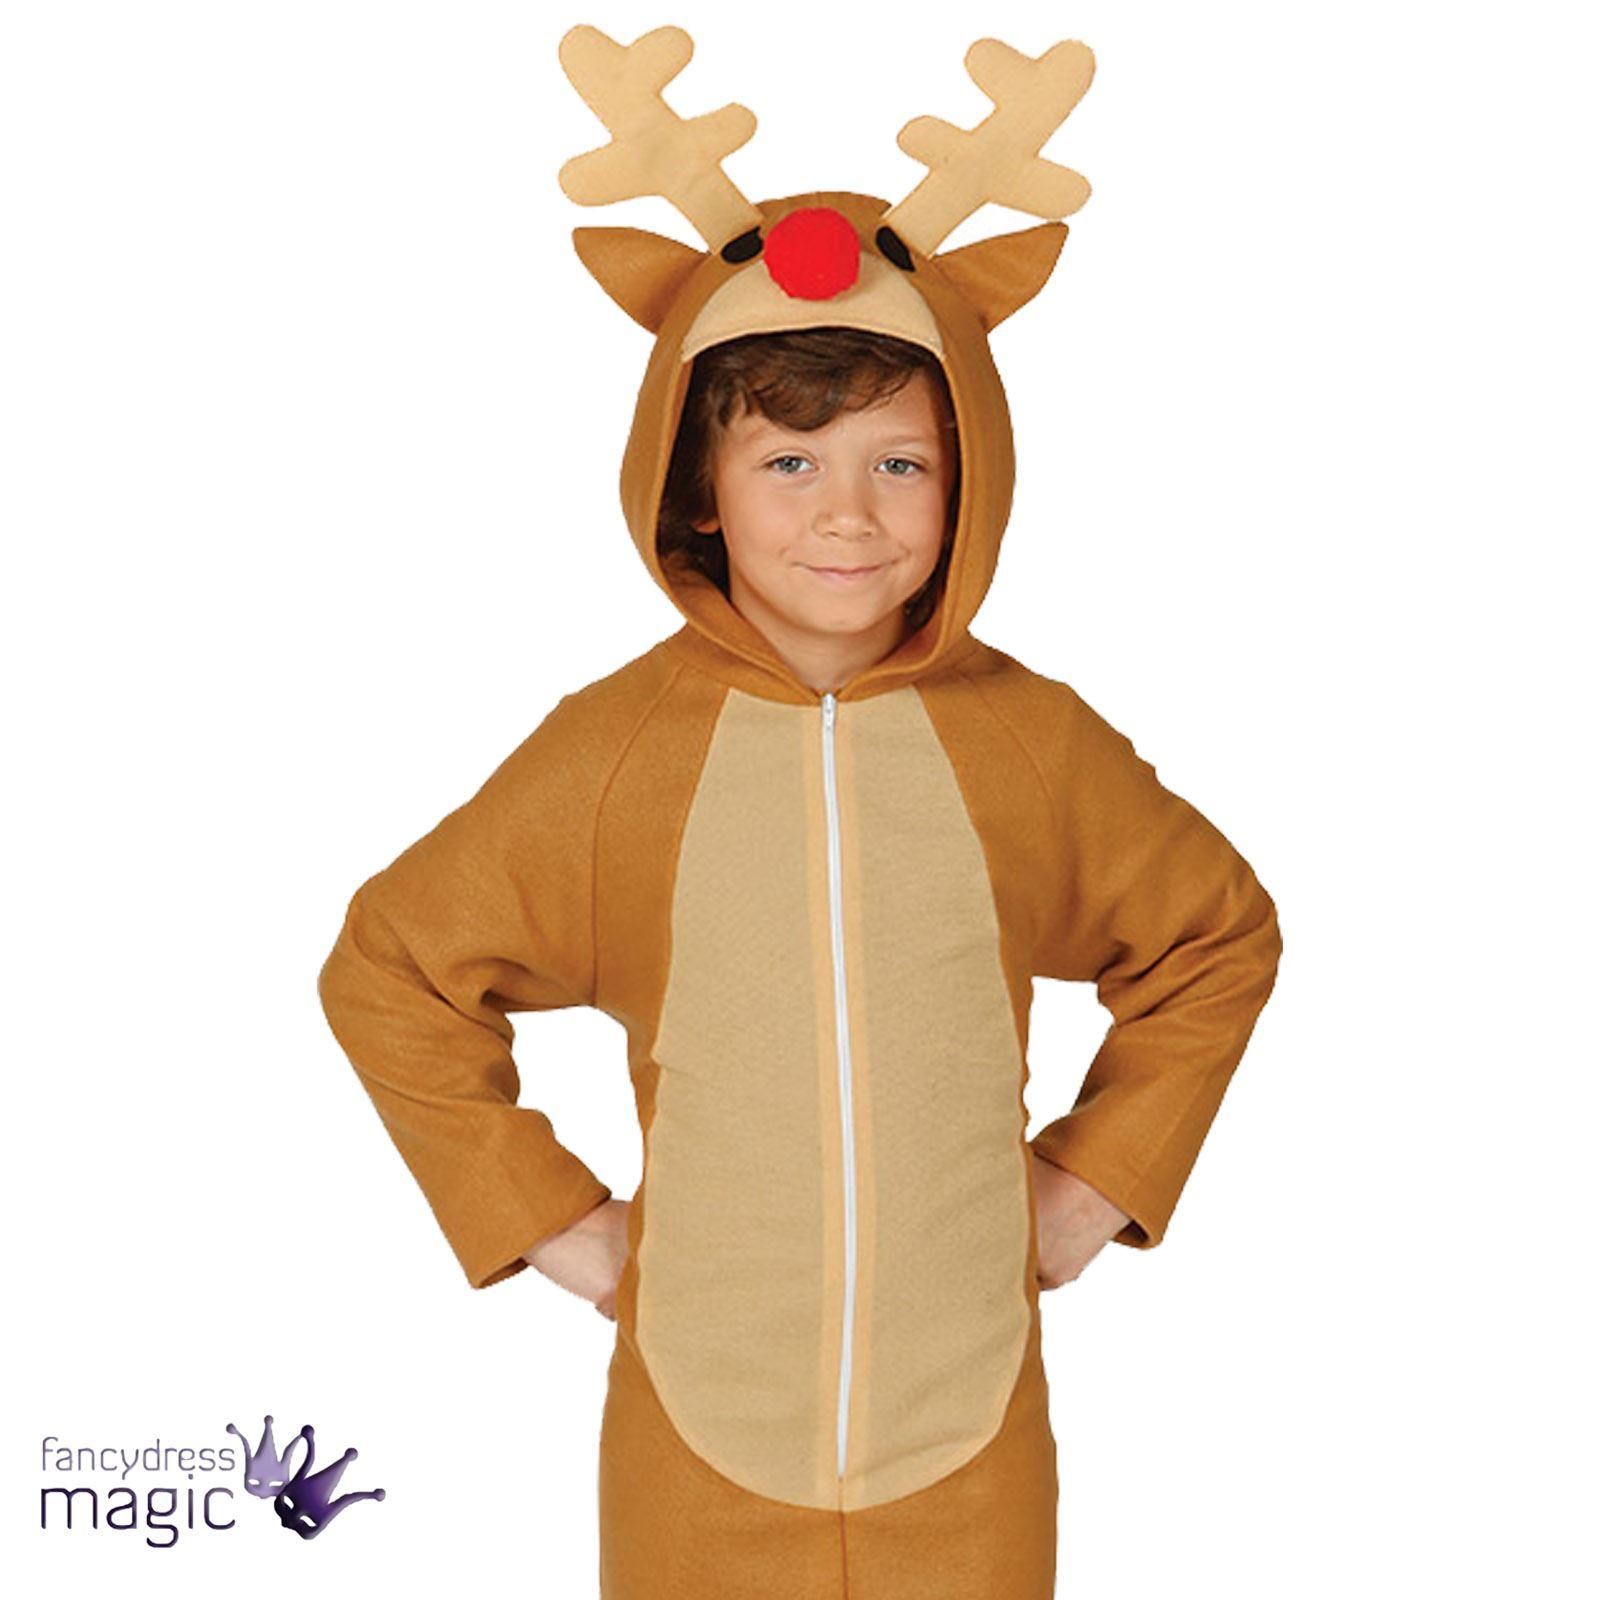 Infantil Infantil Navidad Belen Reno Disfraz Mono Ebay - Disfraz-reno